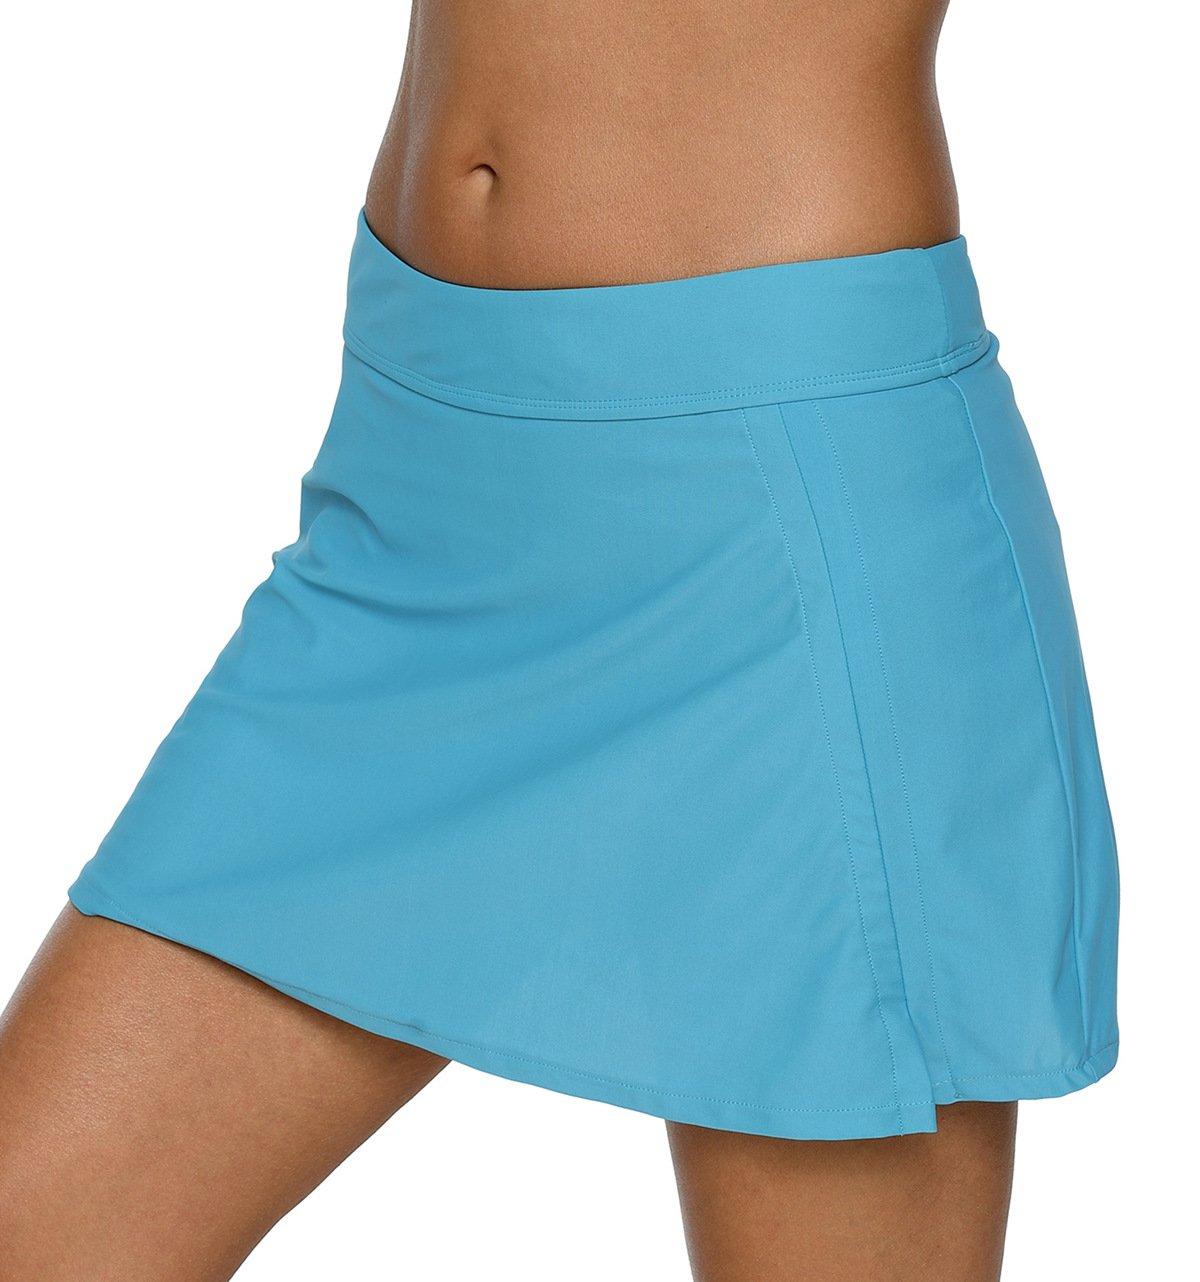 BeautyIn Skirted Tankini Bottoms Swimwear for Womens Blue Skirt Swimsuit M